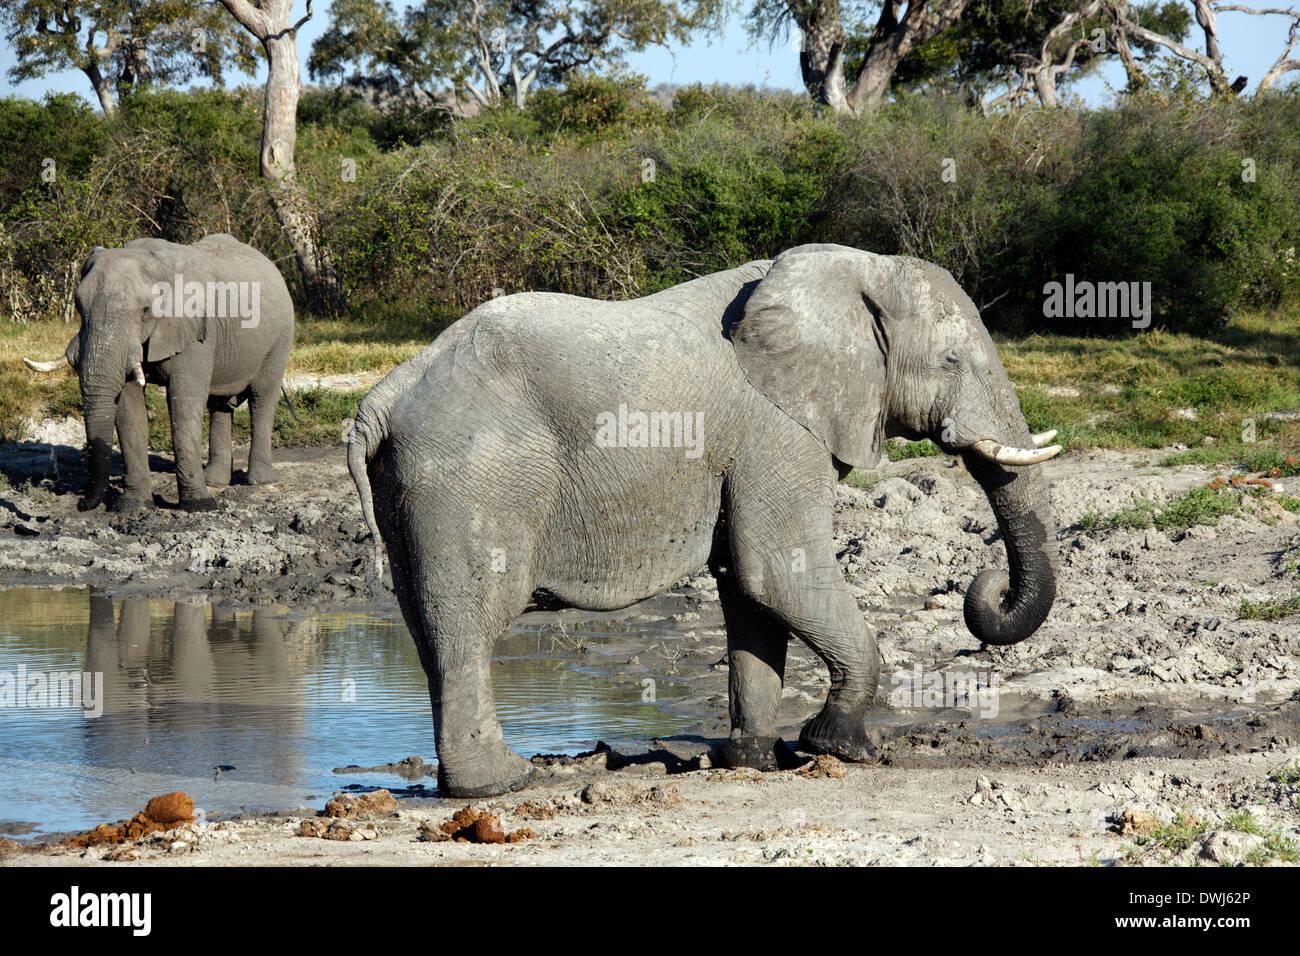 African elephants (Loxodonta africana) drinking at a waterhole in Savuti in Botswana - Stock Image